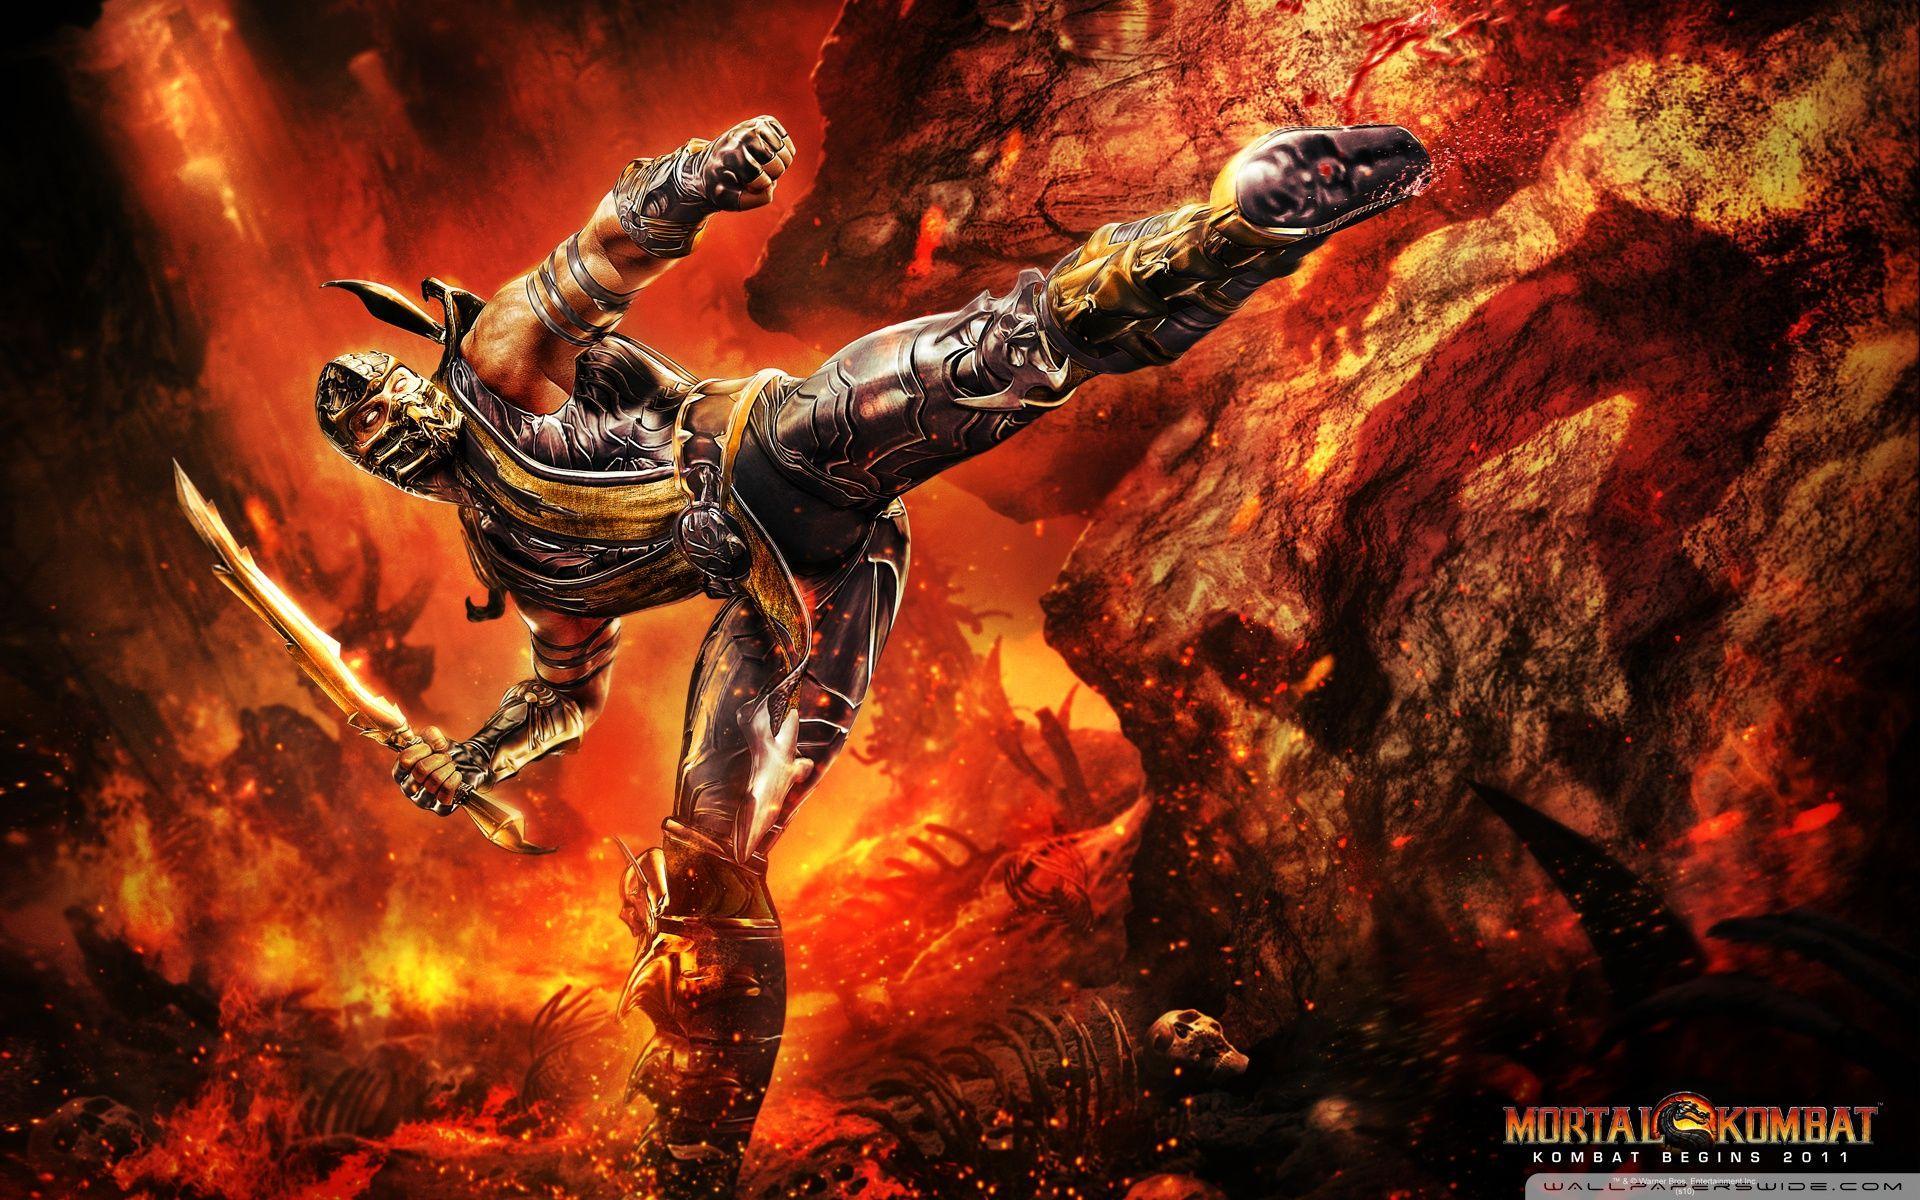 Mortal Kombat 9 Scorpion Wallpapers Hd Wallpaper Cave